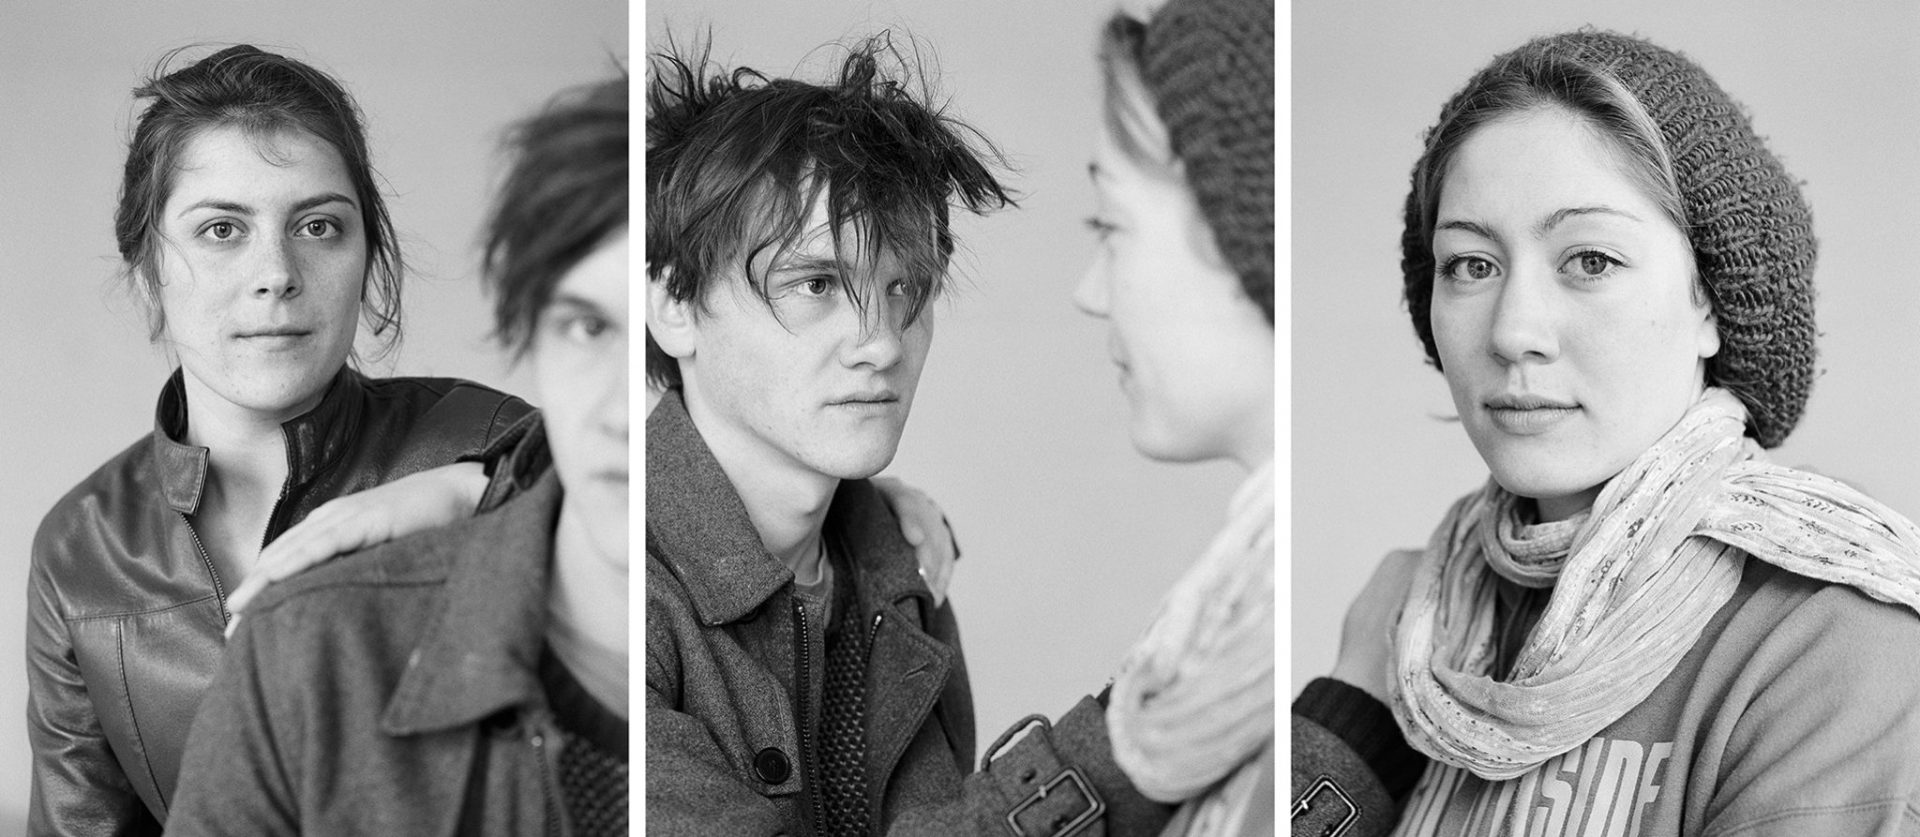 Laura, Jakob und Hannah, 2012 © Loredana Nemes